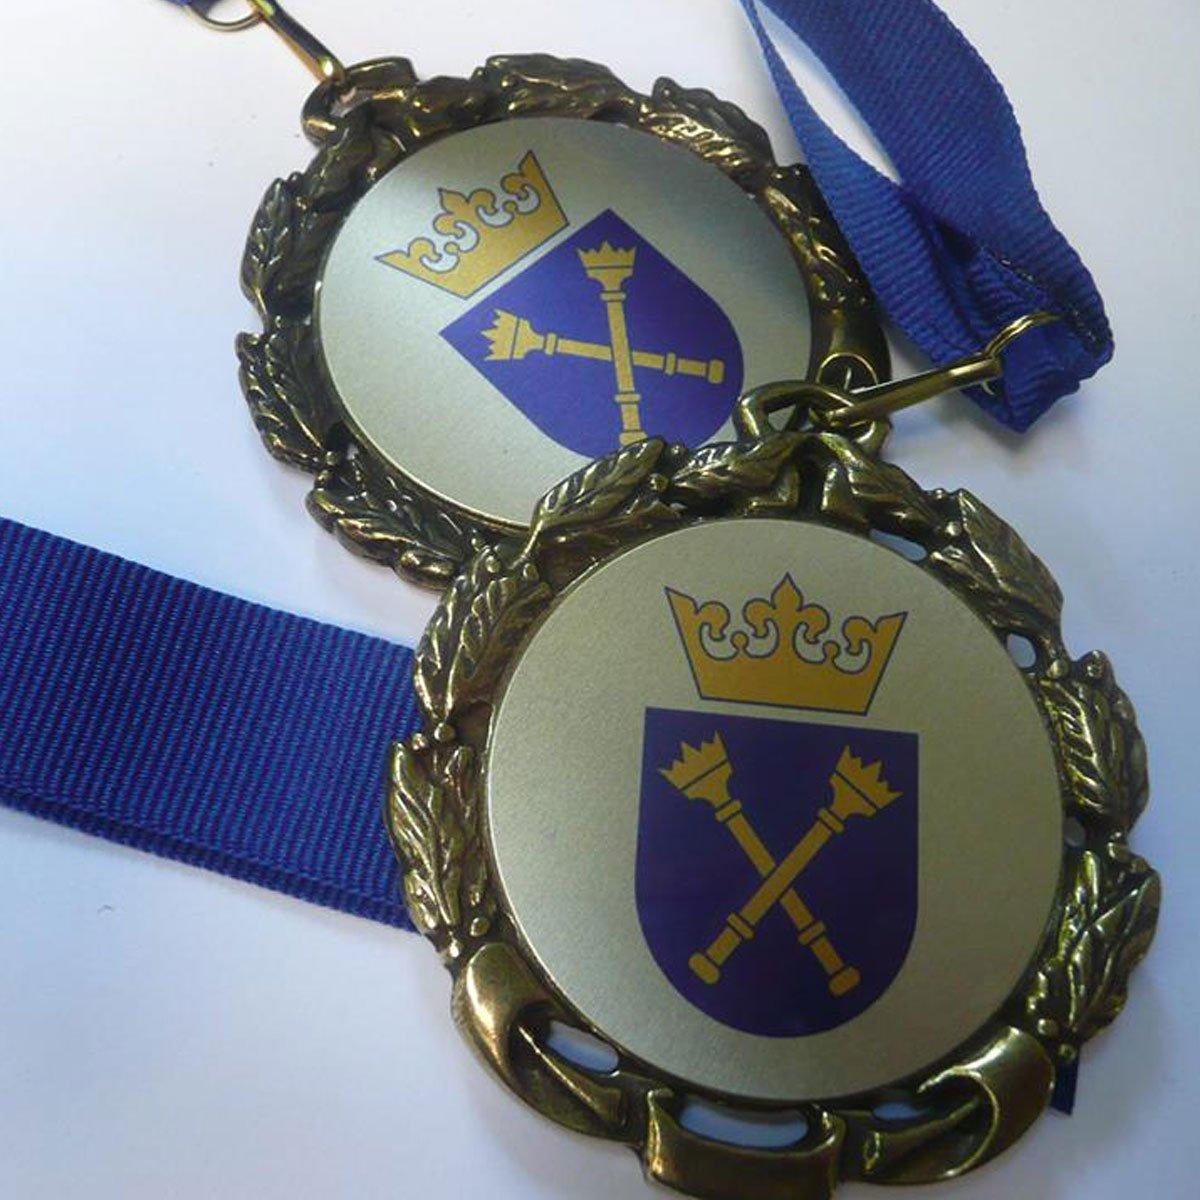 Medale ze wstążkami UJ